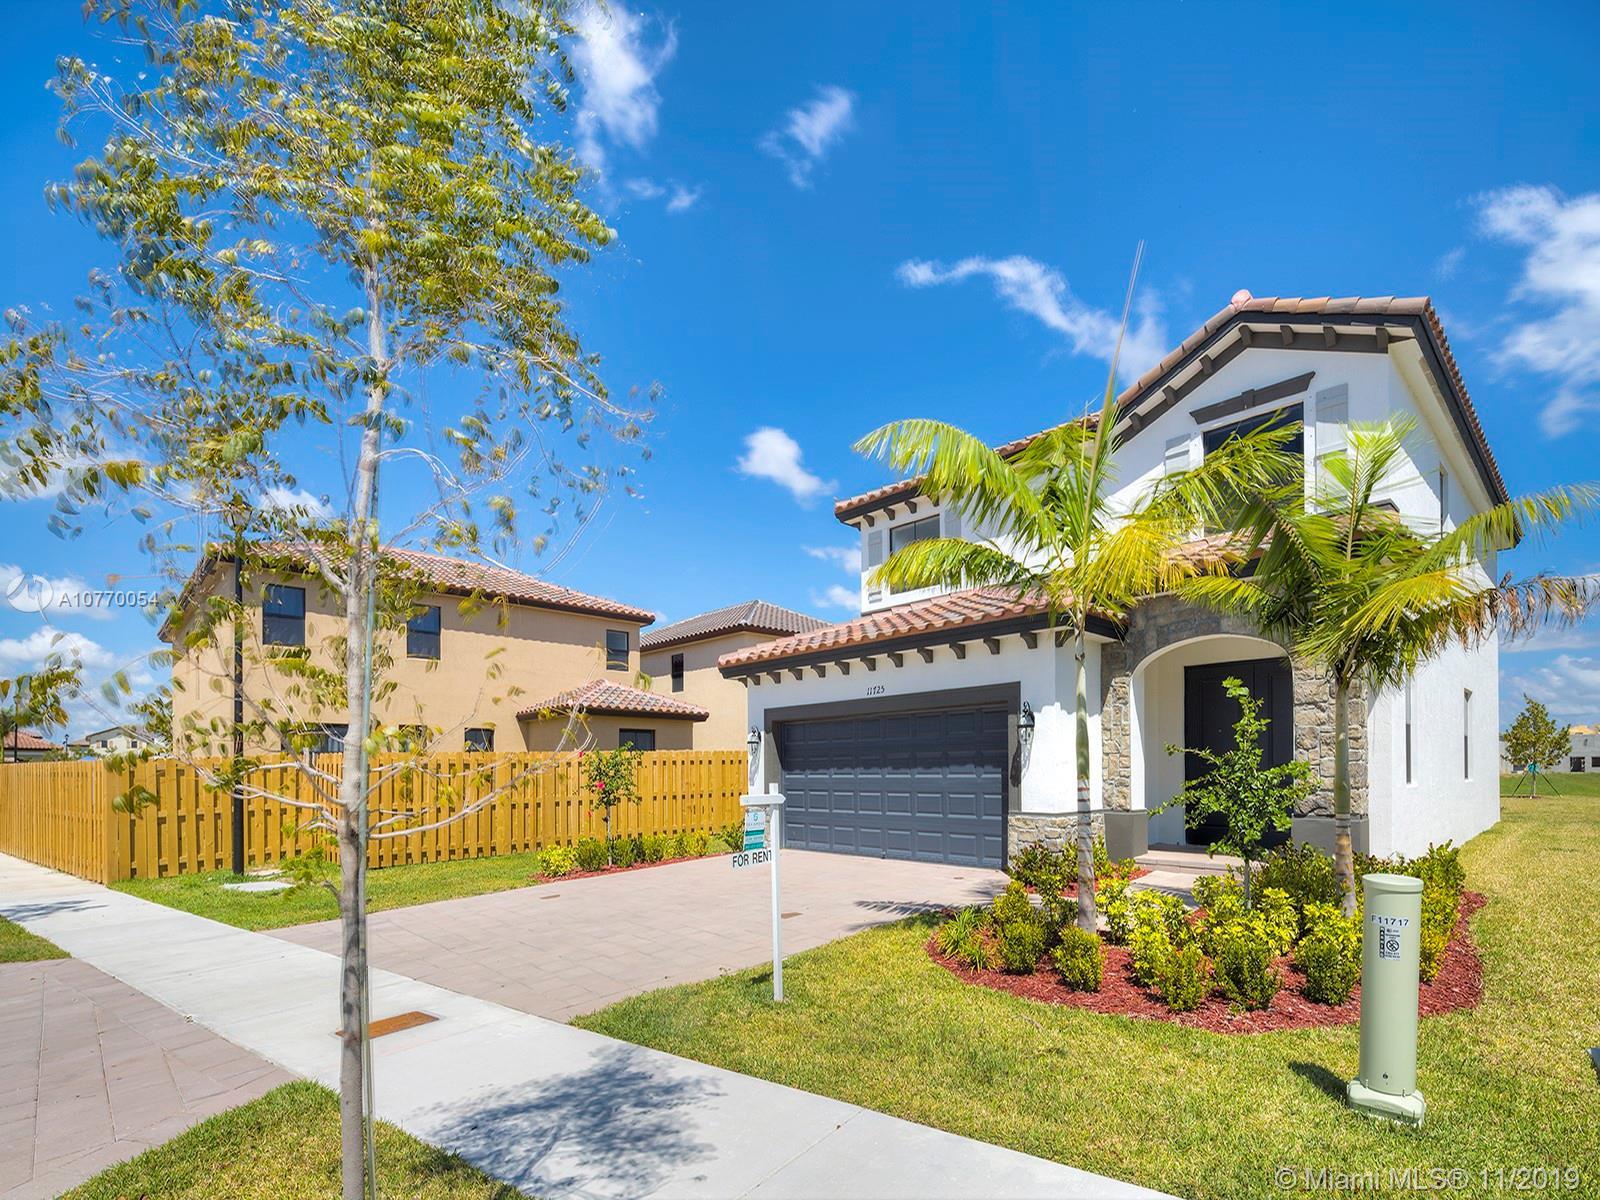 11725 SW 253rd St, Homestead, FL 33032 - Homestead, FL real estate listing